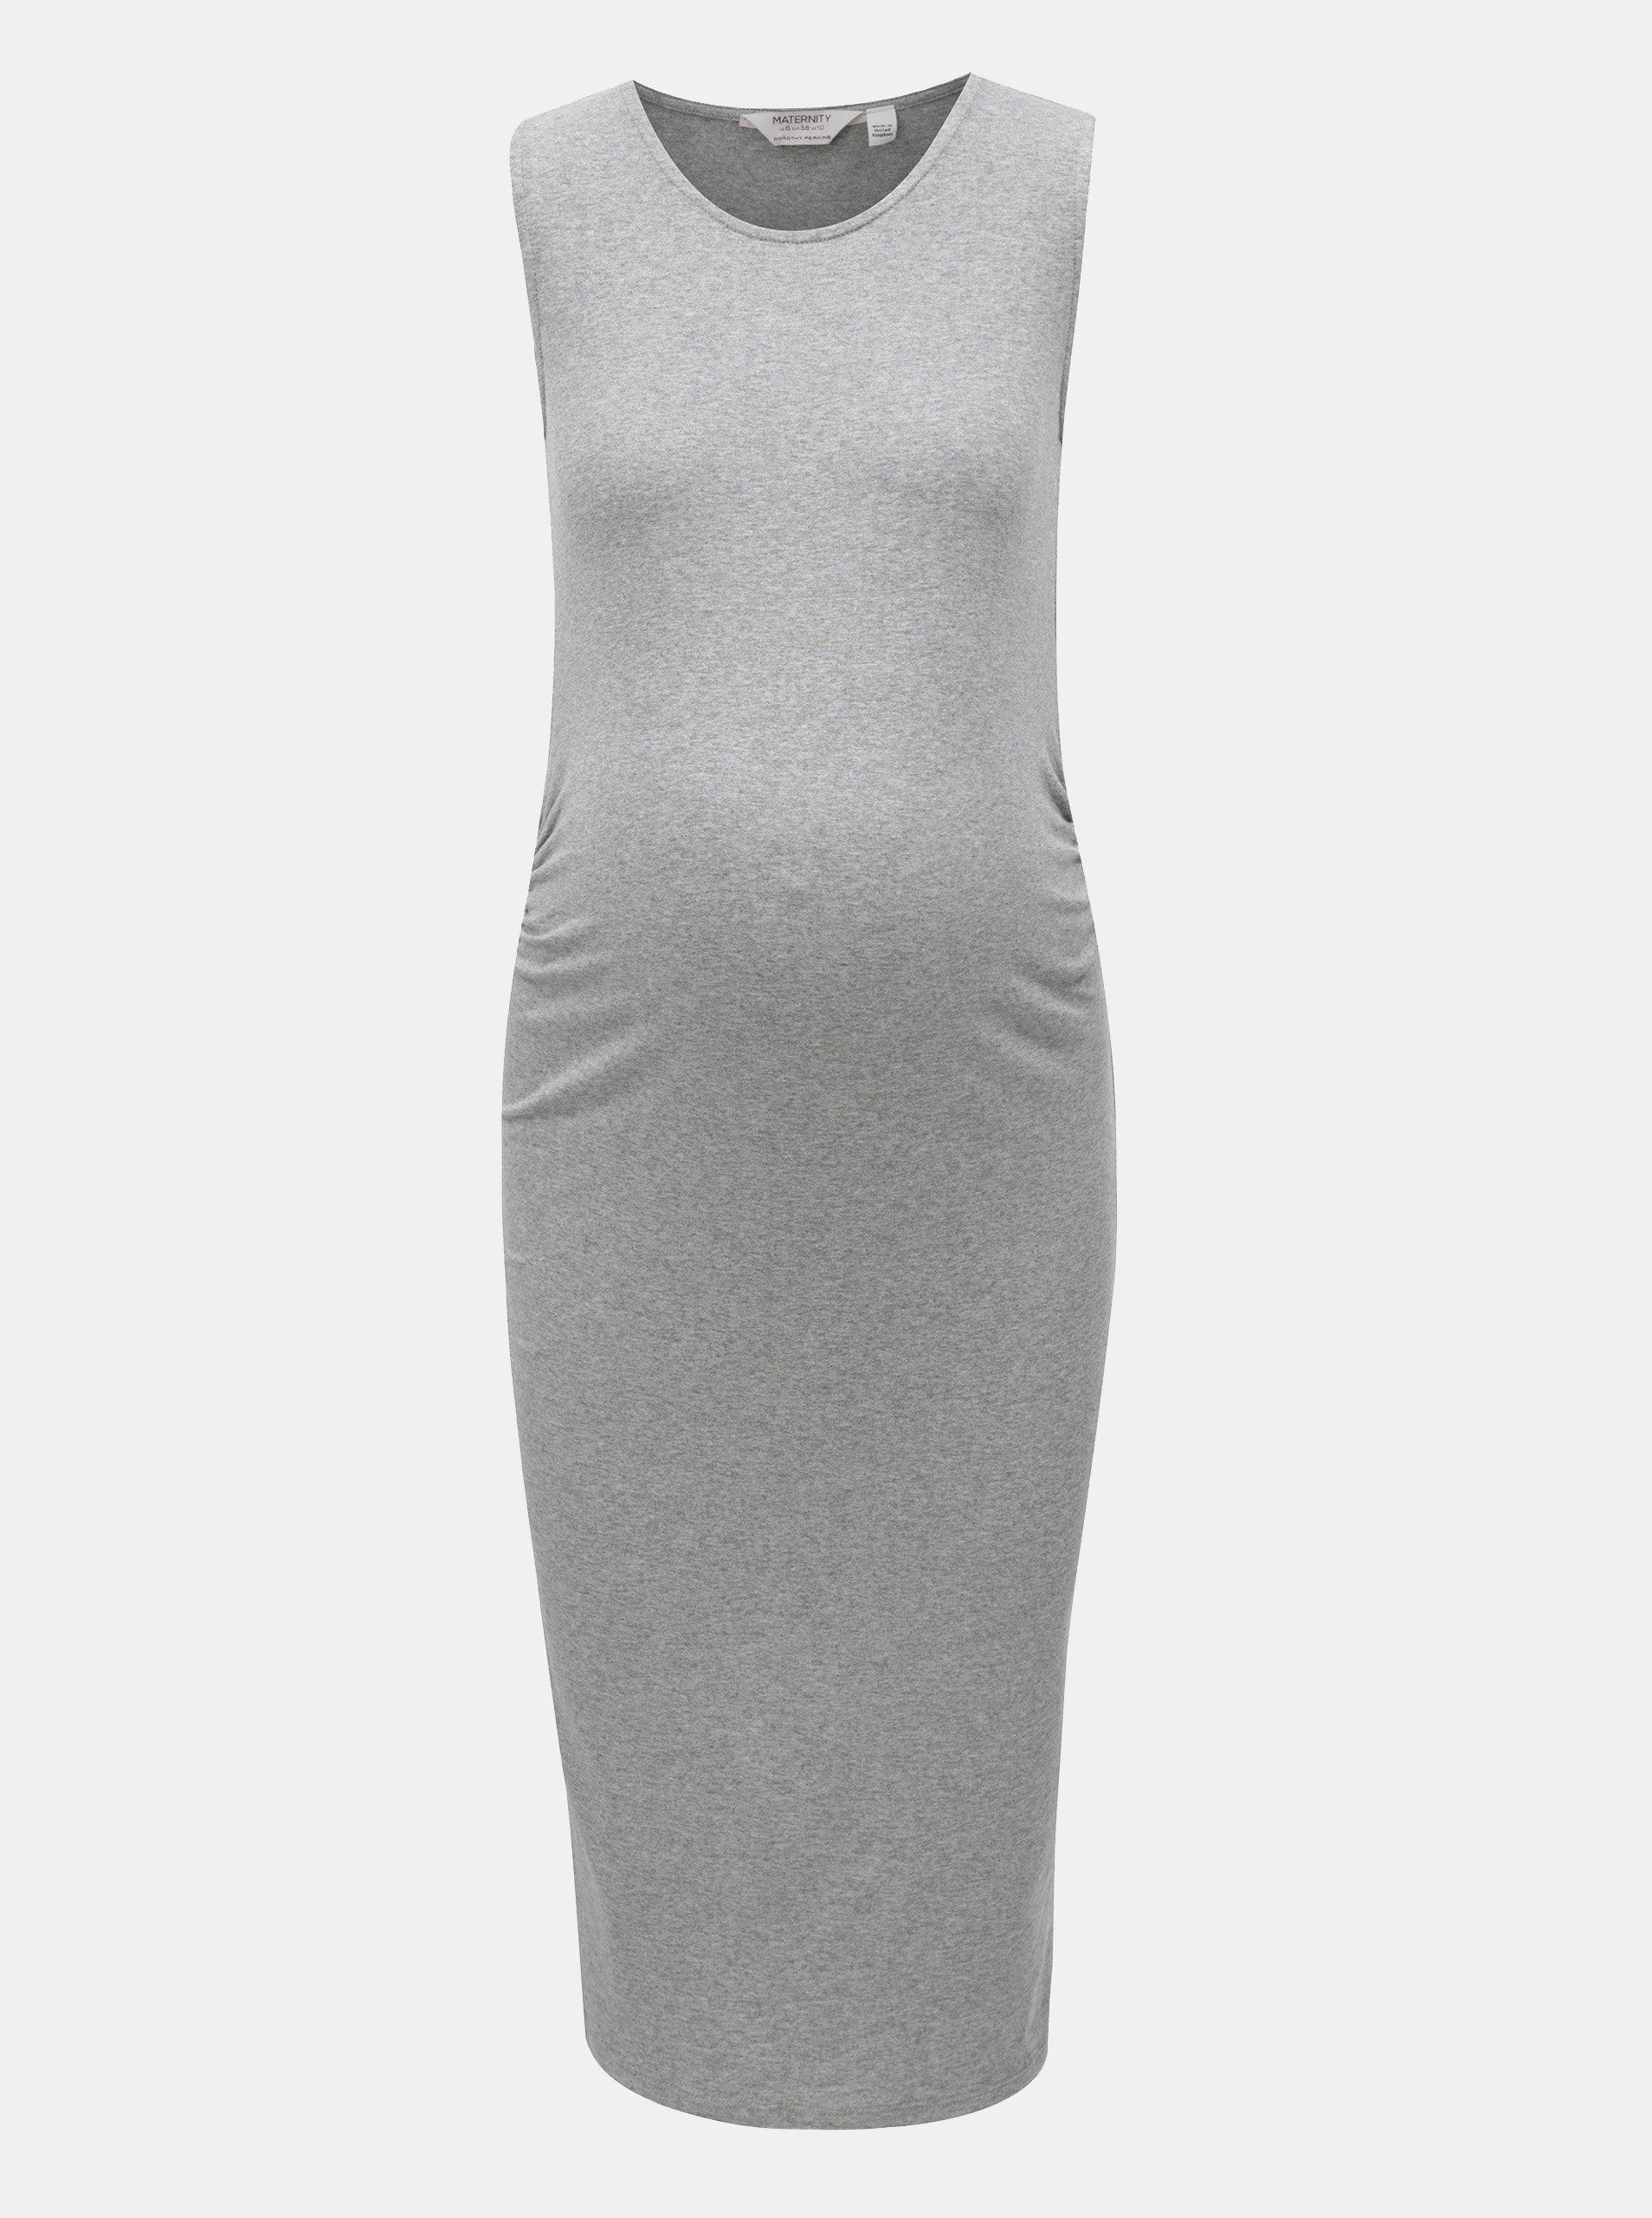 674444830ef8 Sivé tehotenské melírované šaty Dorothy Perkins Maternity